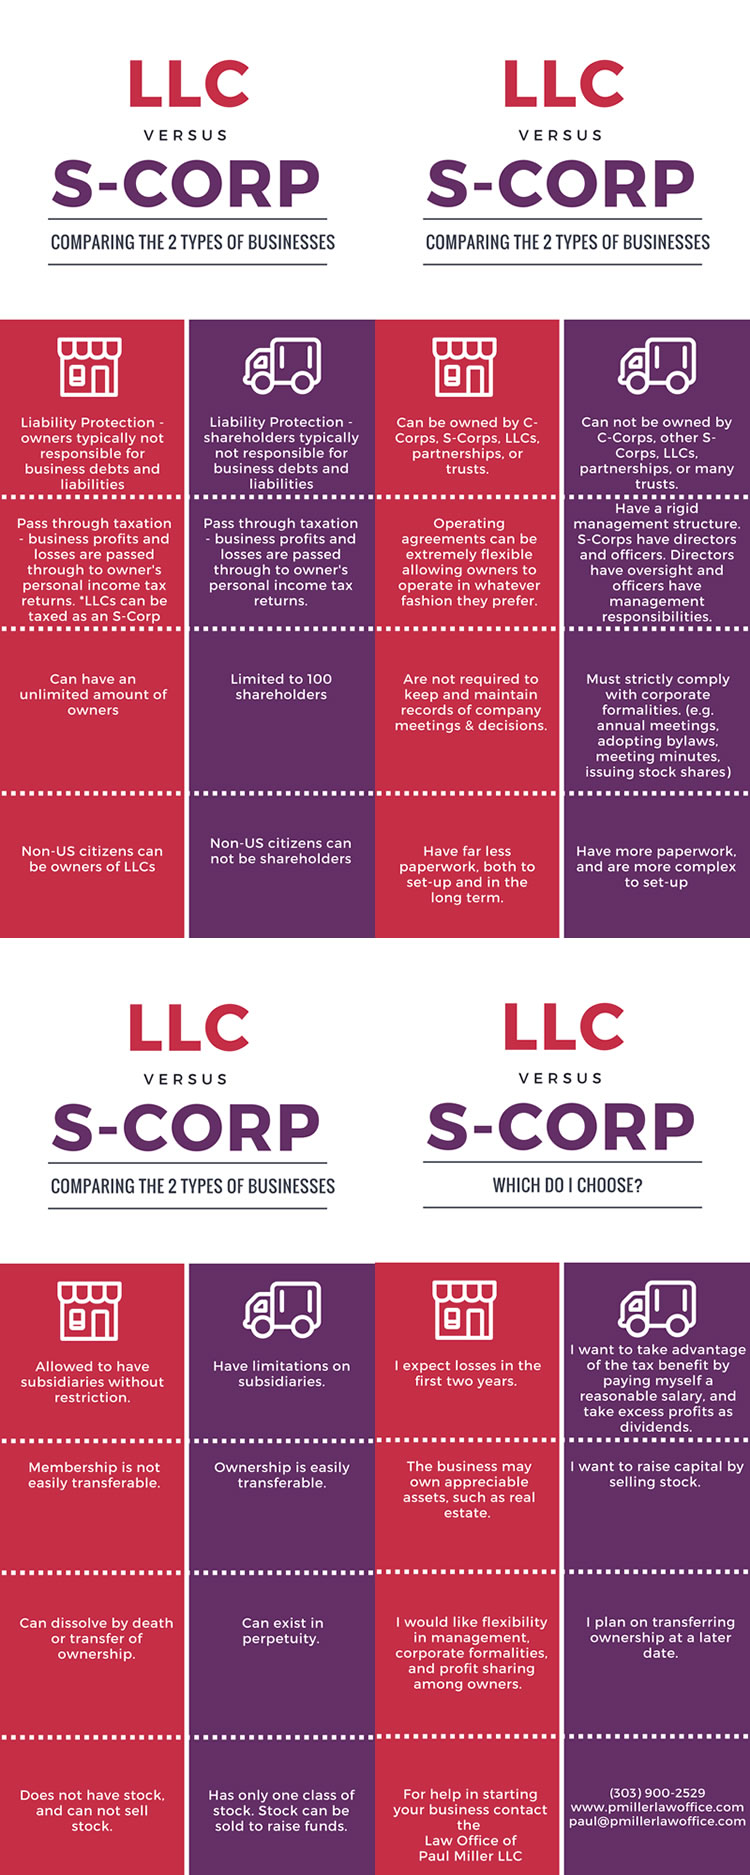 llc versus s